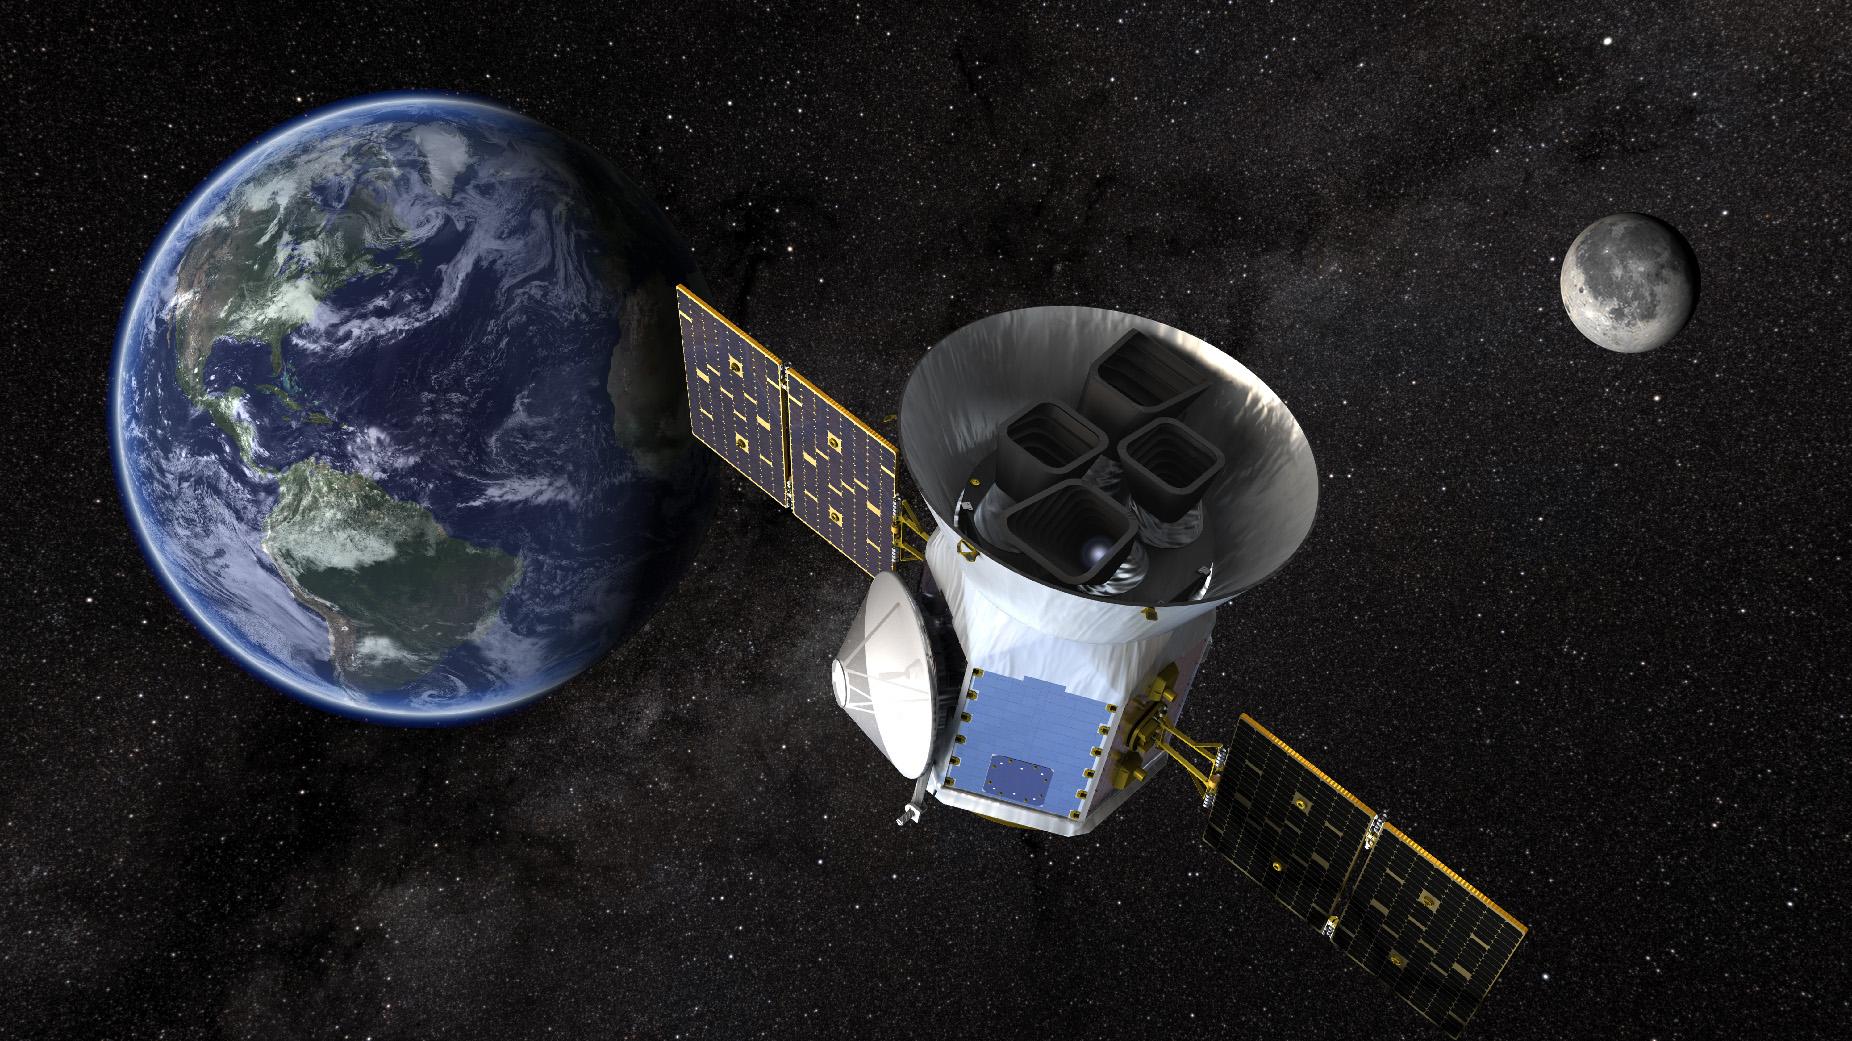 An artist's illustration of the Transiting Exoplanet Survey Satellite. Credits: NASA Goddard Space Flight Center